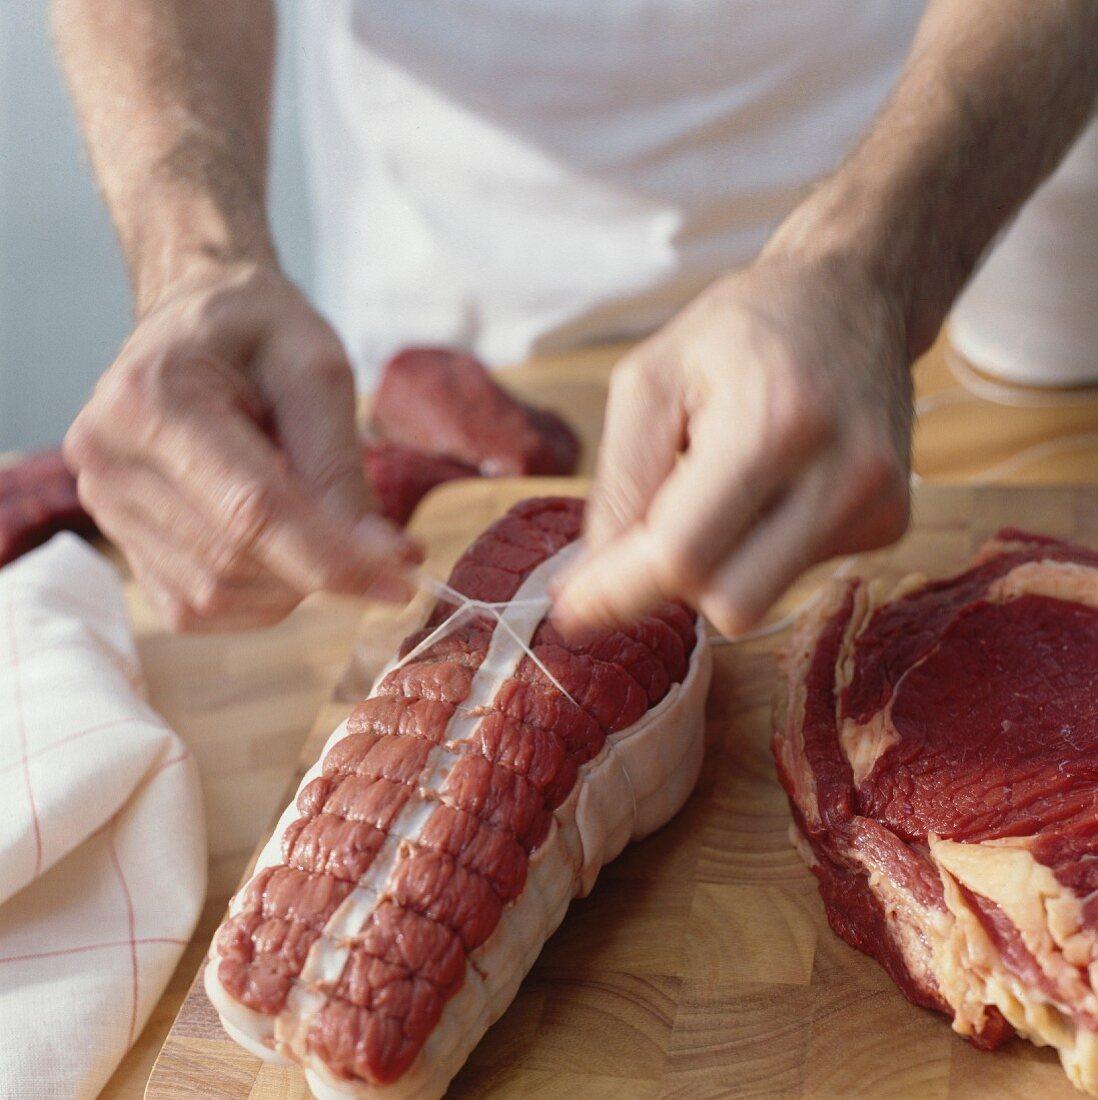 Tying up roast beef